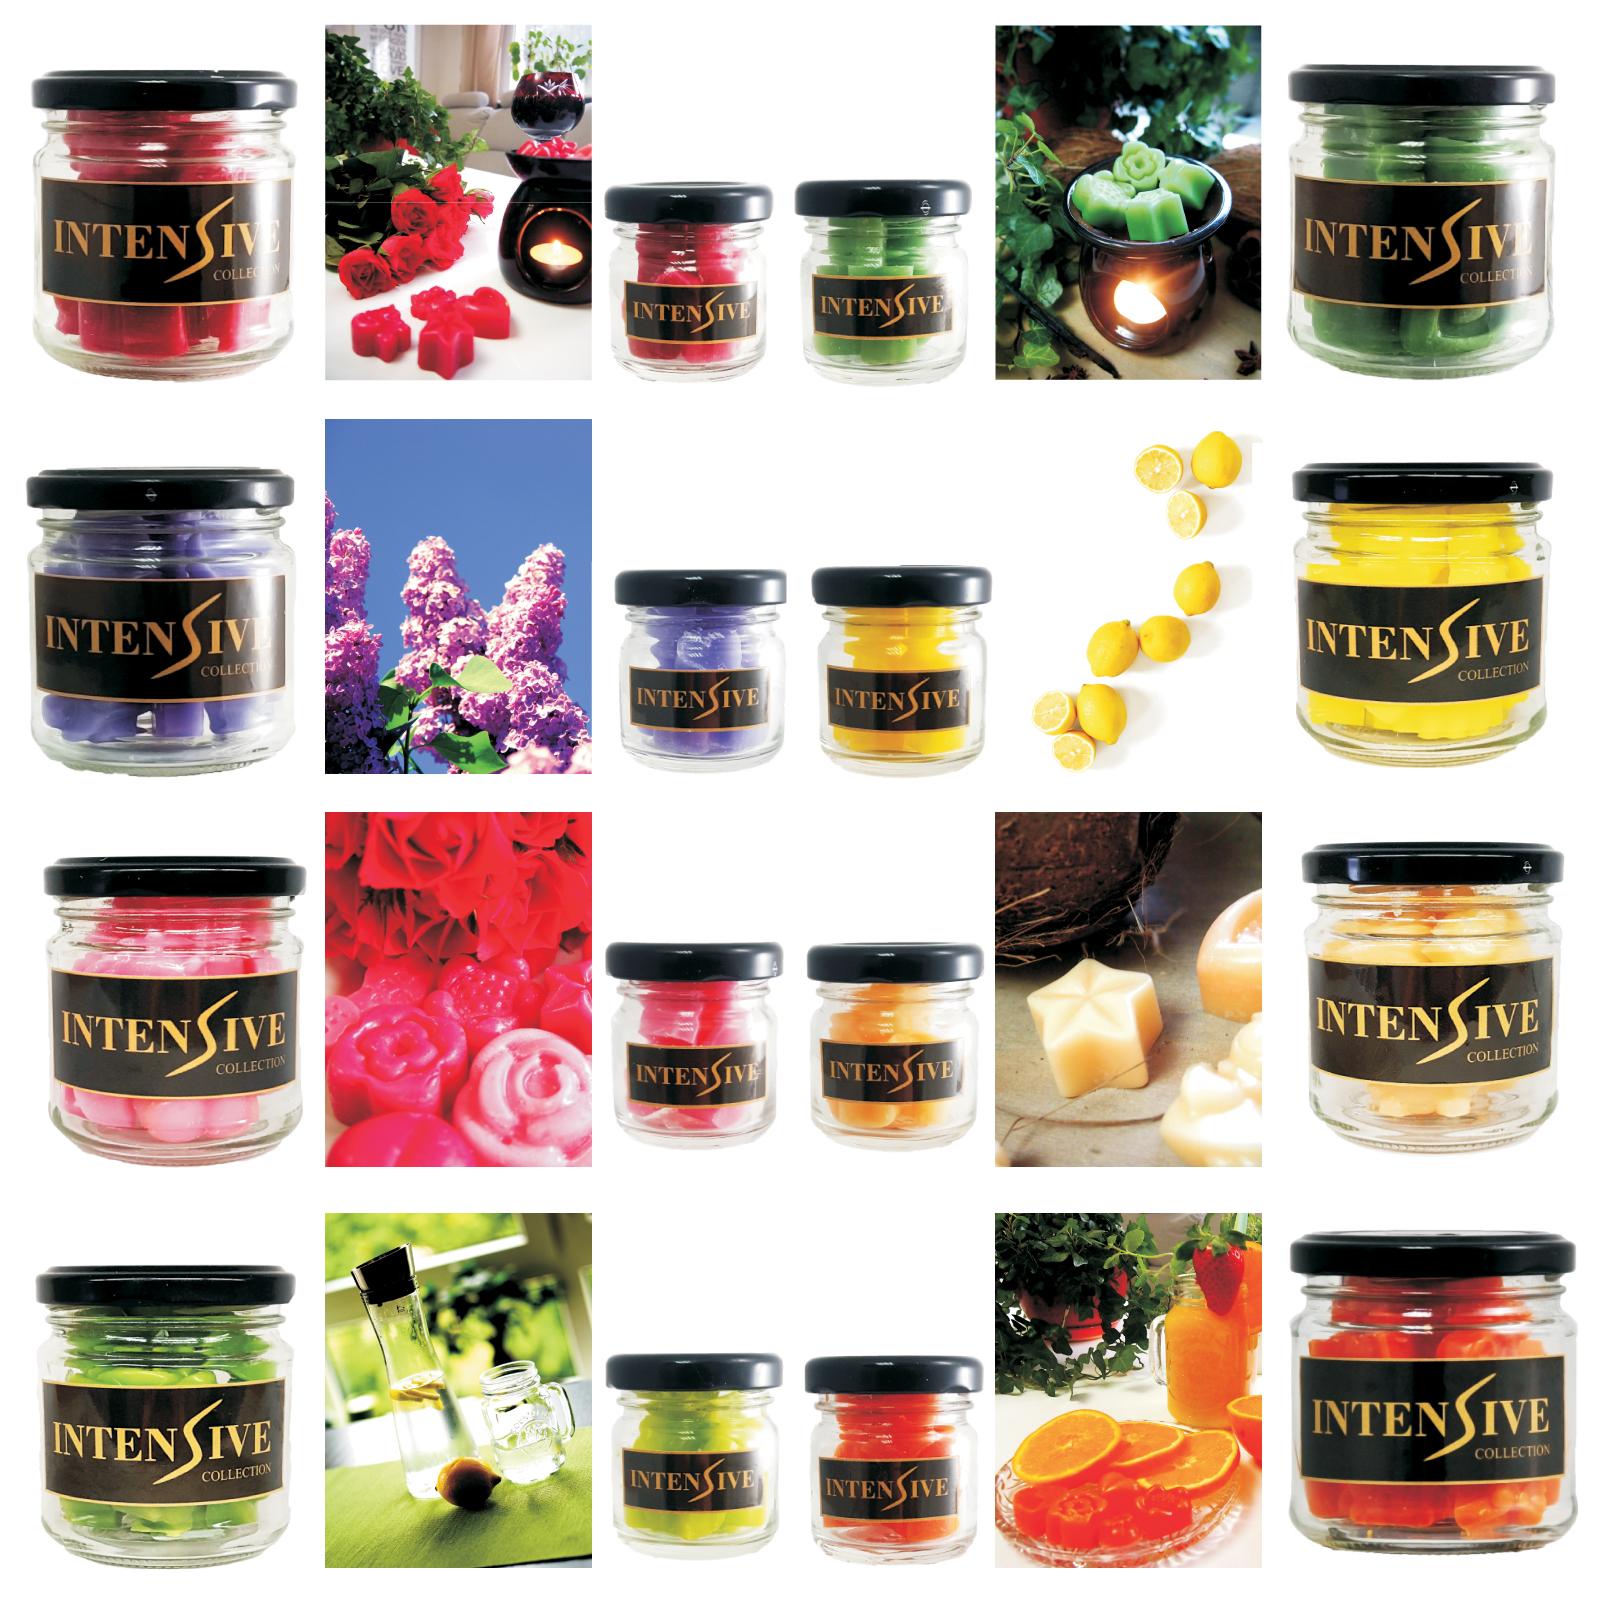 Small Intensive wax melts 40 jars mixed scents